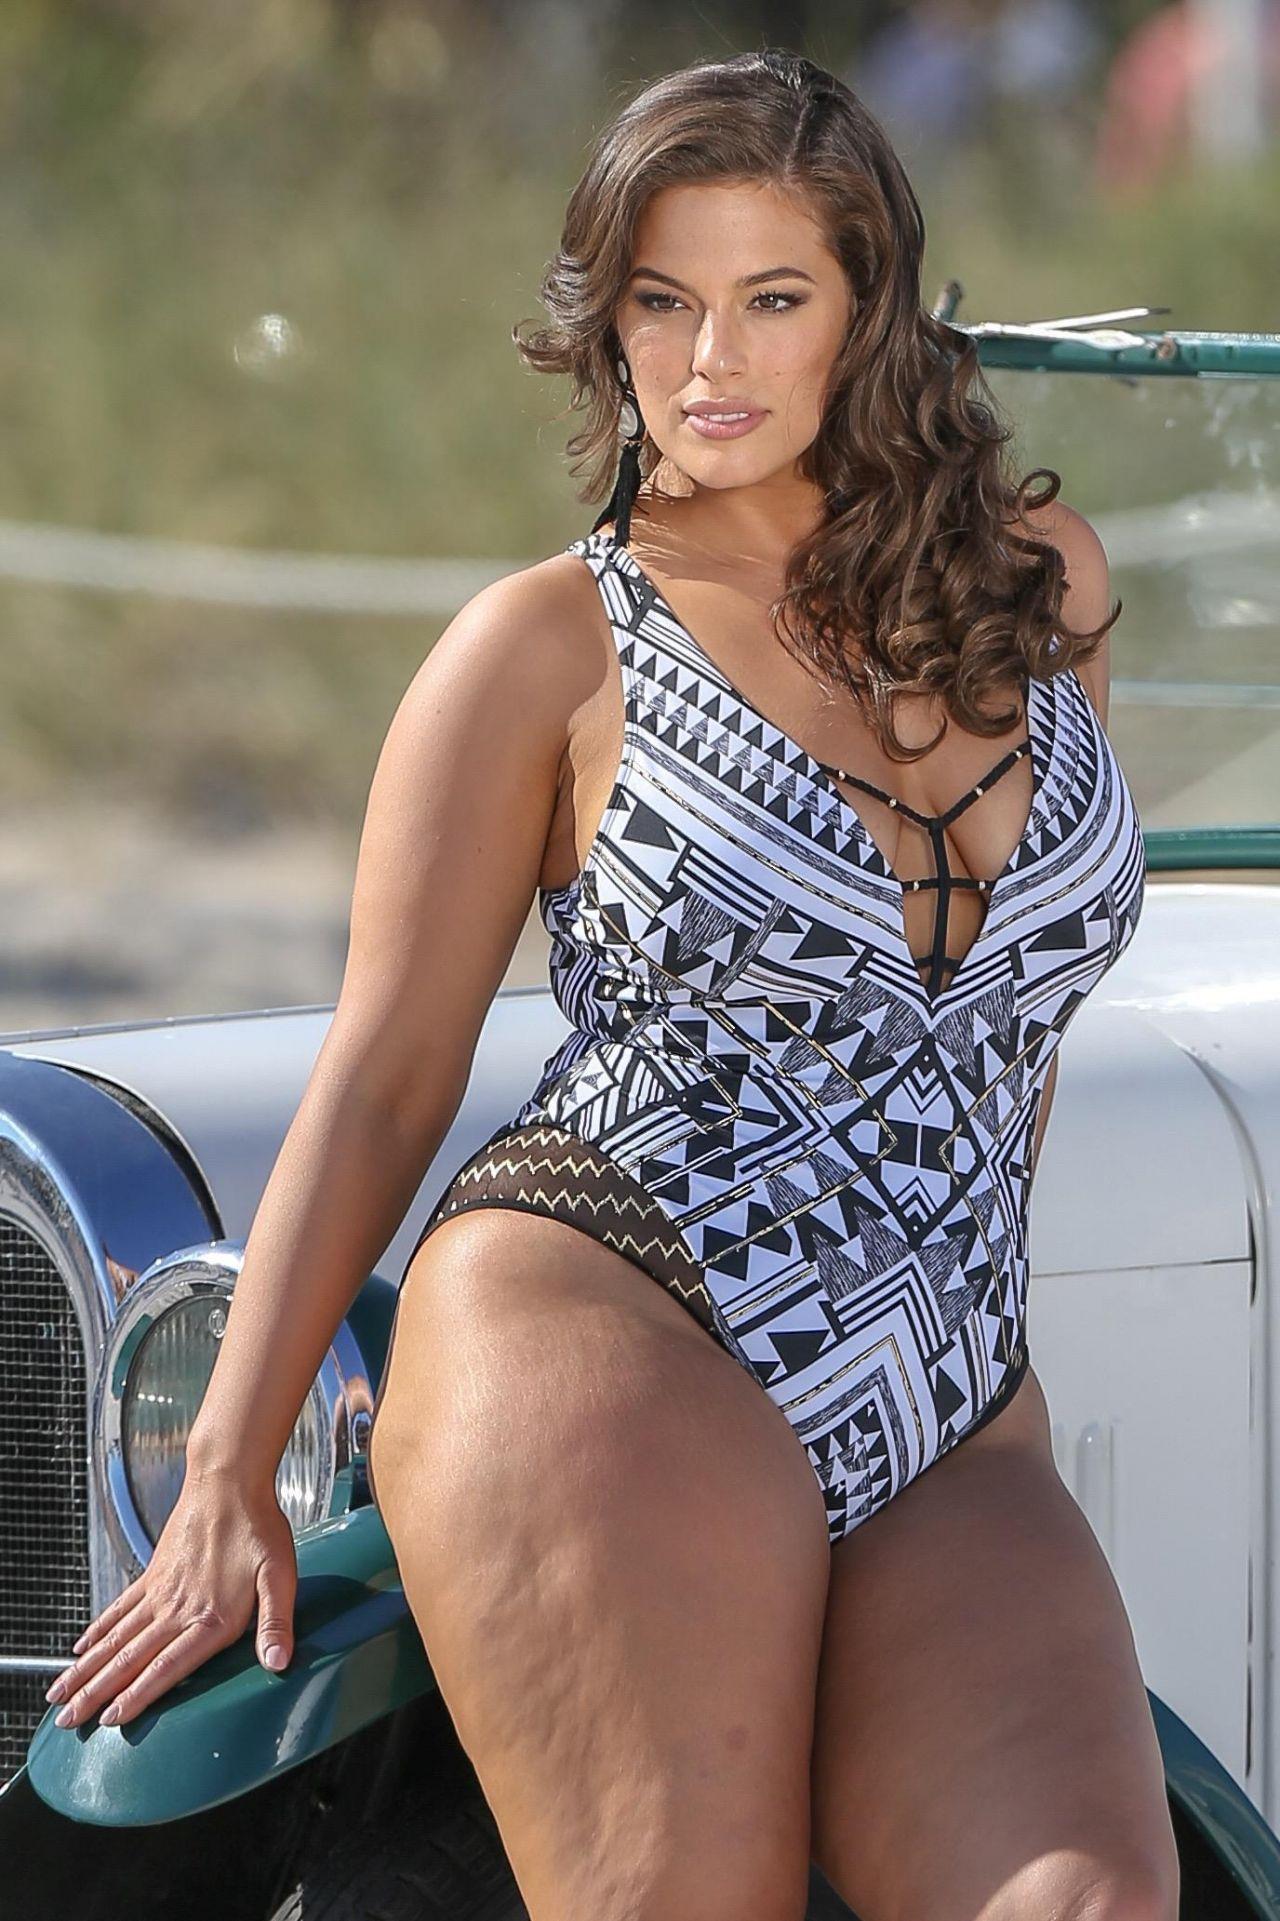 Bikini, Badeanzüge, Ashley Graham, Miami, Übergröße, Maisbrot, Schwarz,  Promis 1c6ce420c8